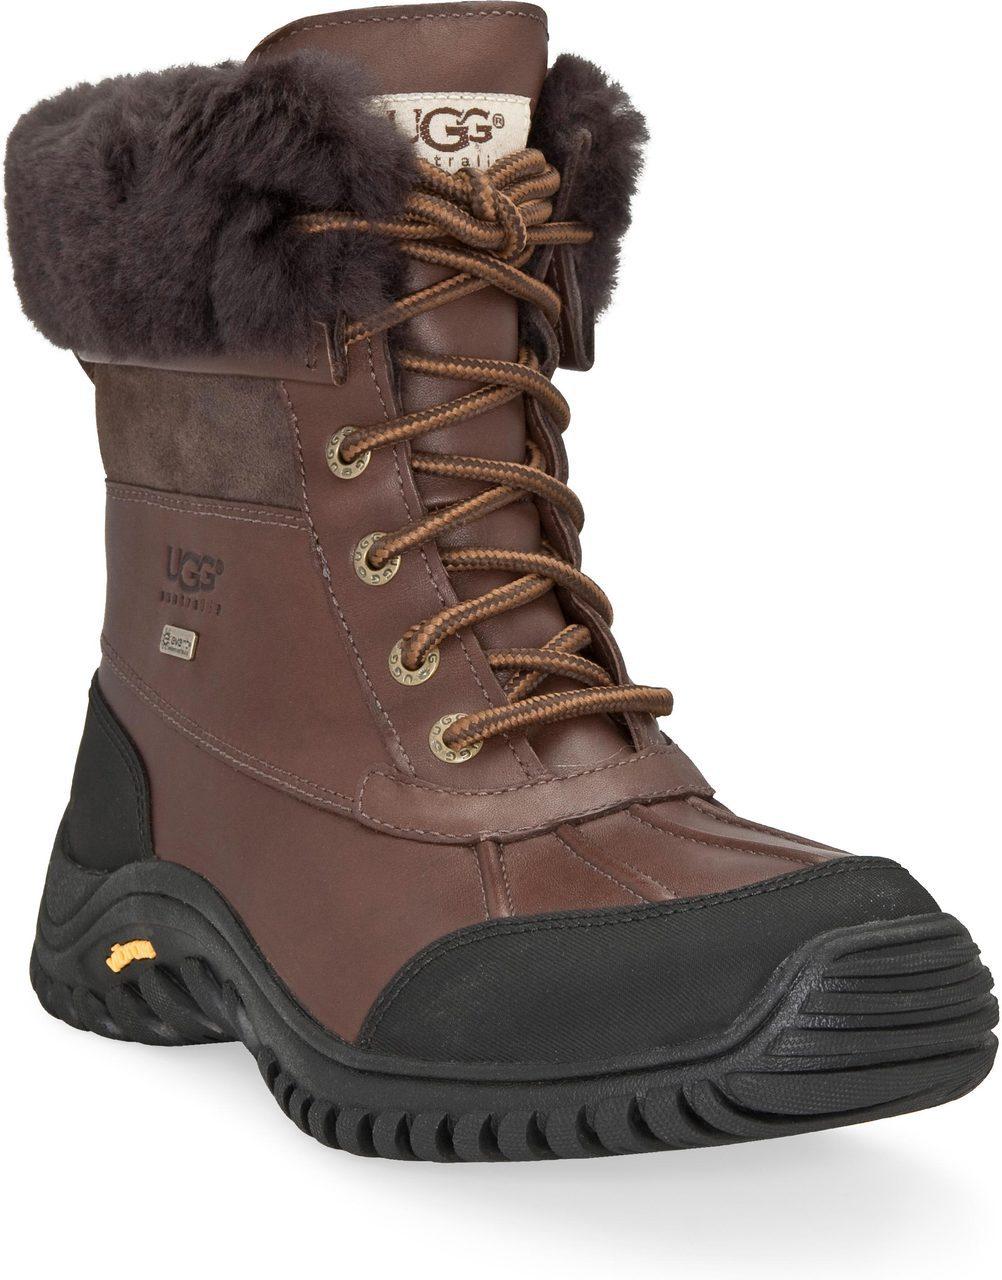 Ugg Rain Boots For Fall Englin S Fine Footwear